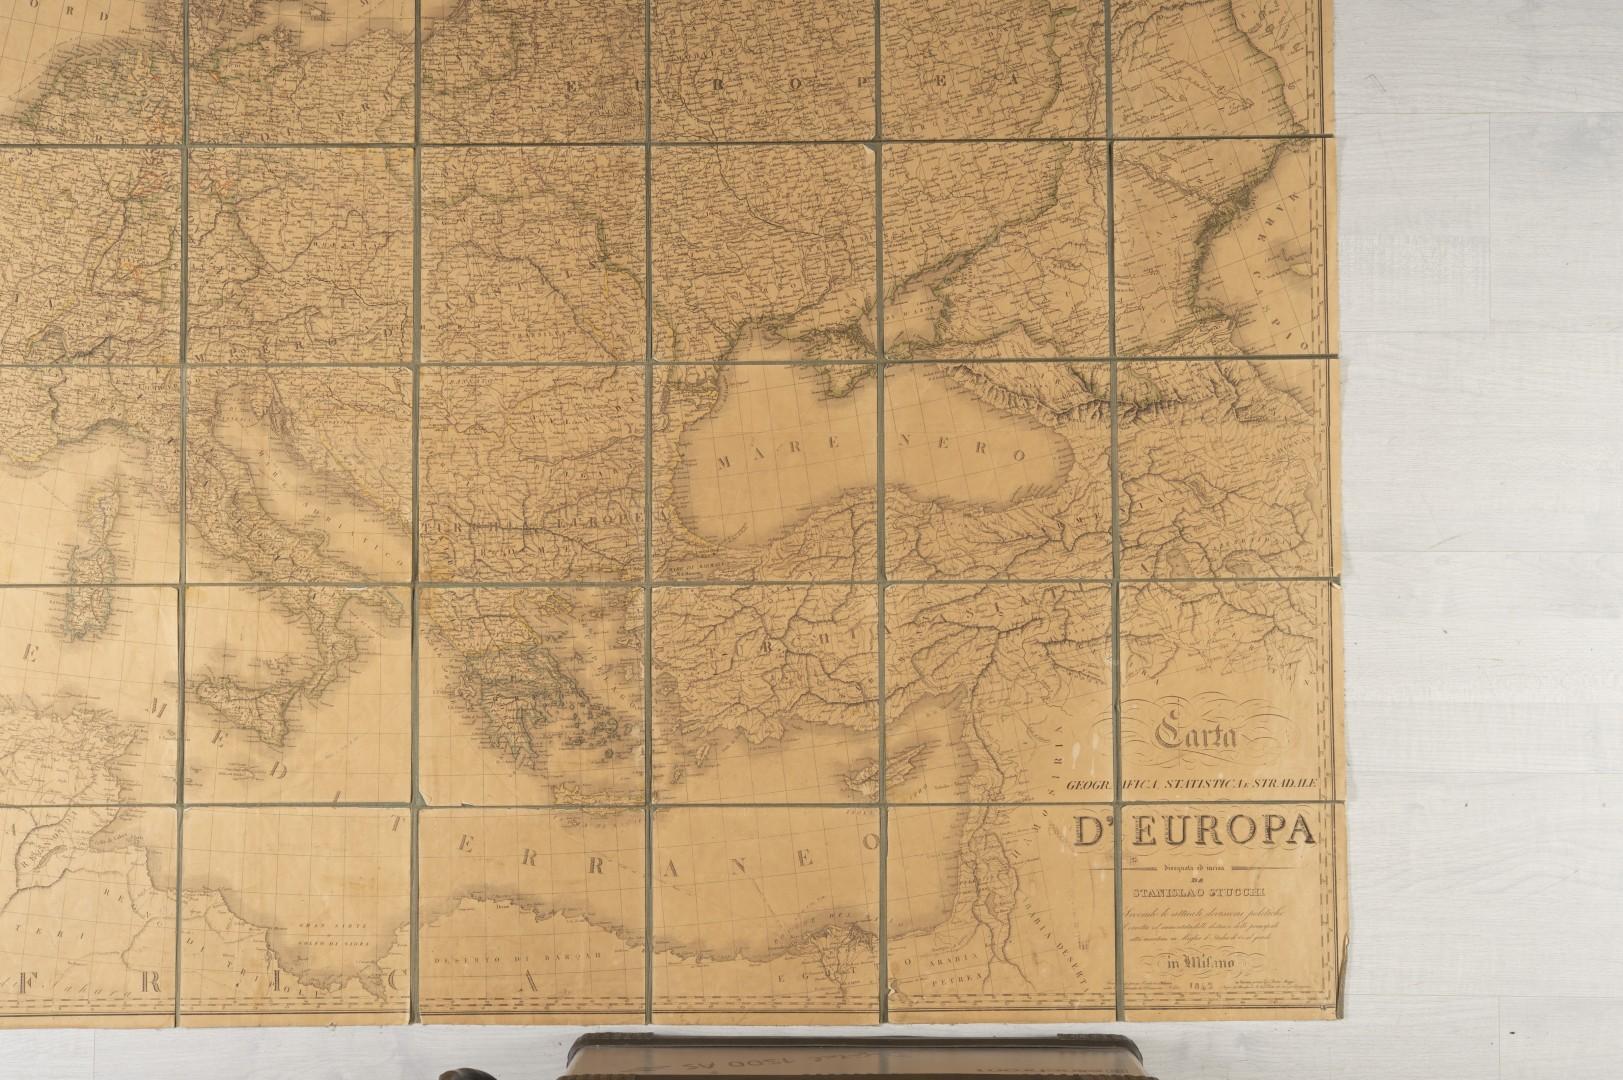 Stucchi, Stanislao Carta geografica statistica e stradale d'Europa. - Image 5 of 8